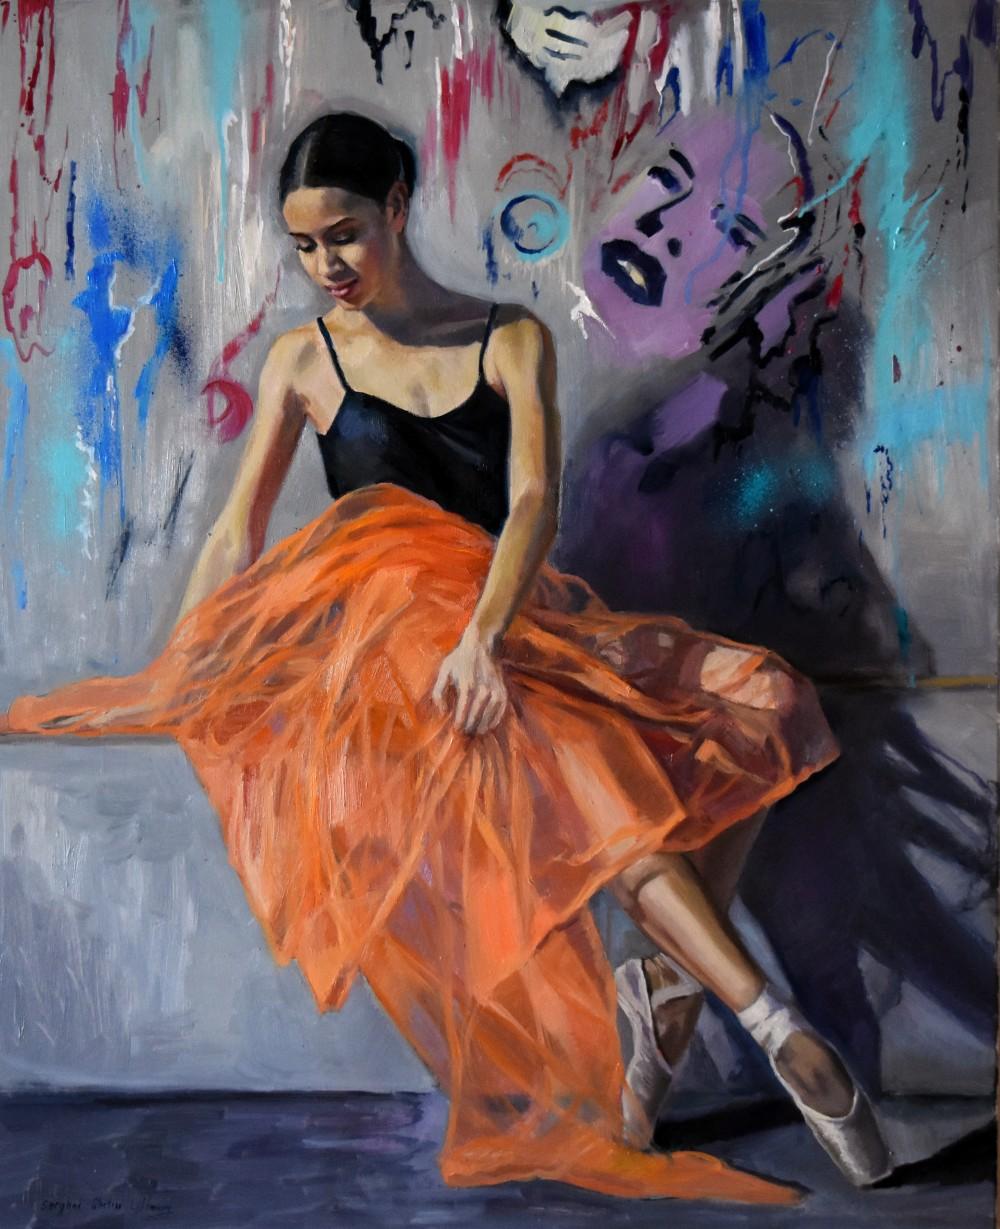 The Street Ballet Dancer